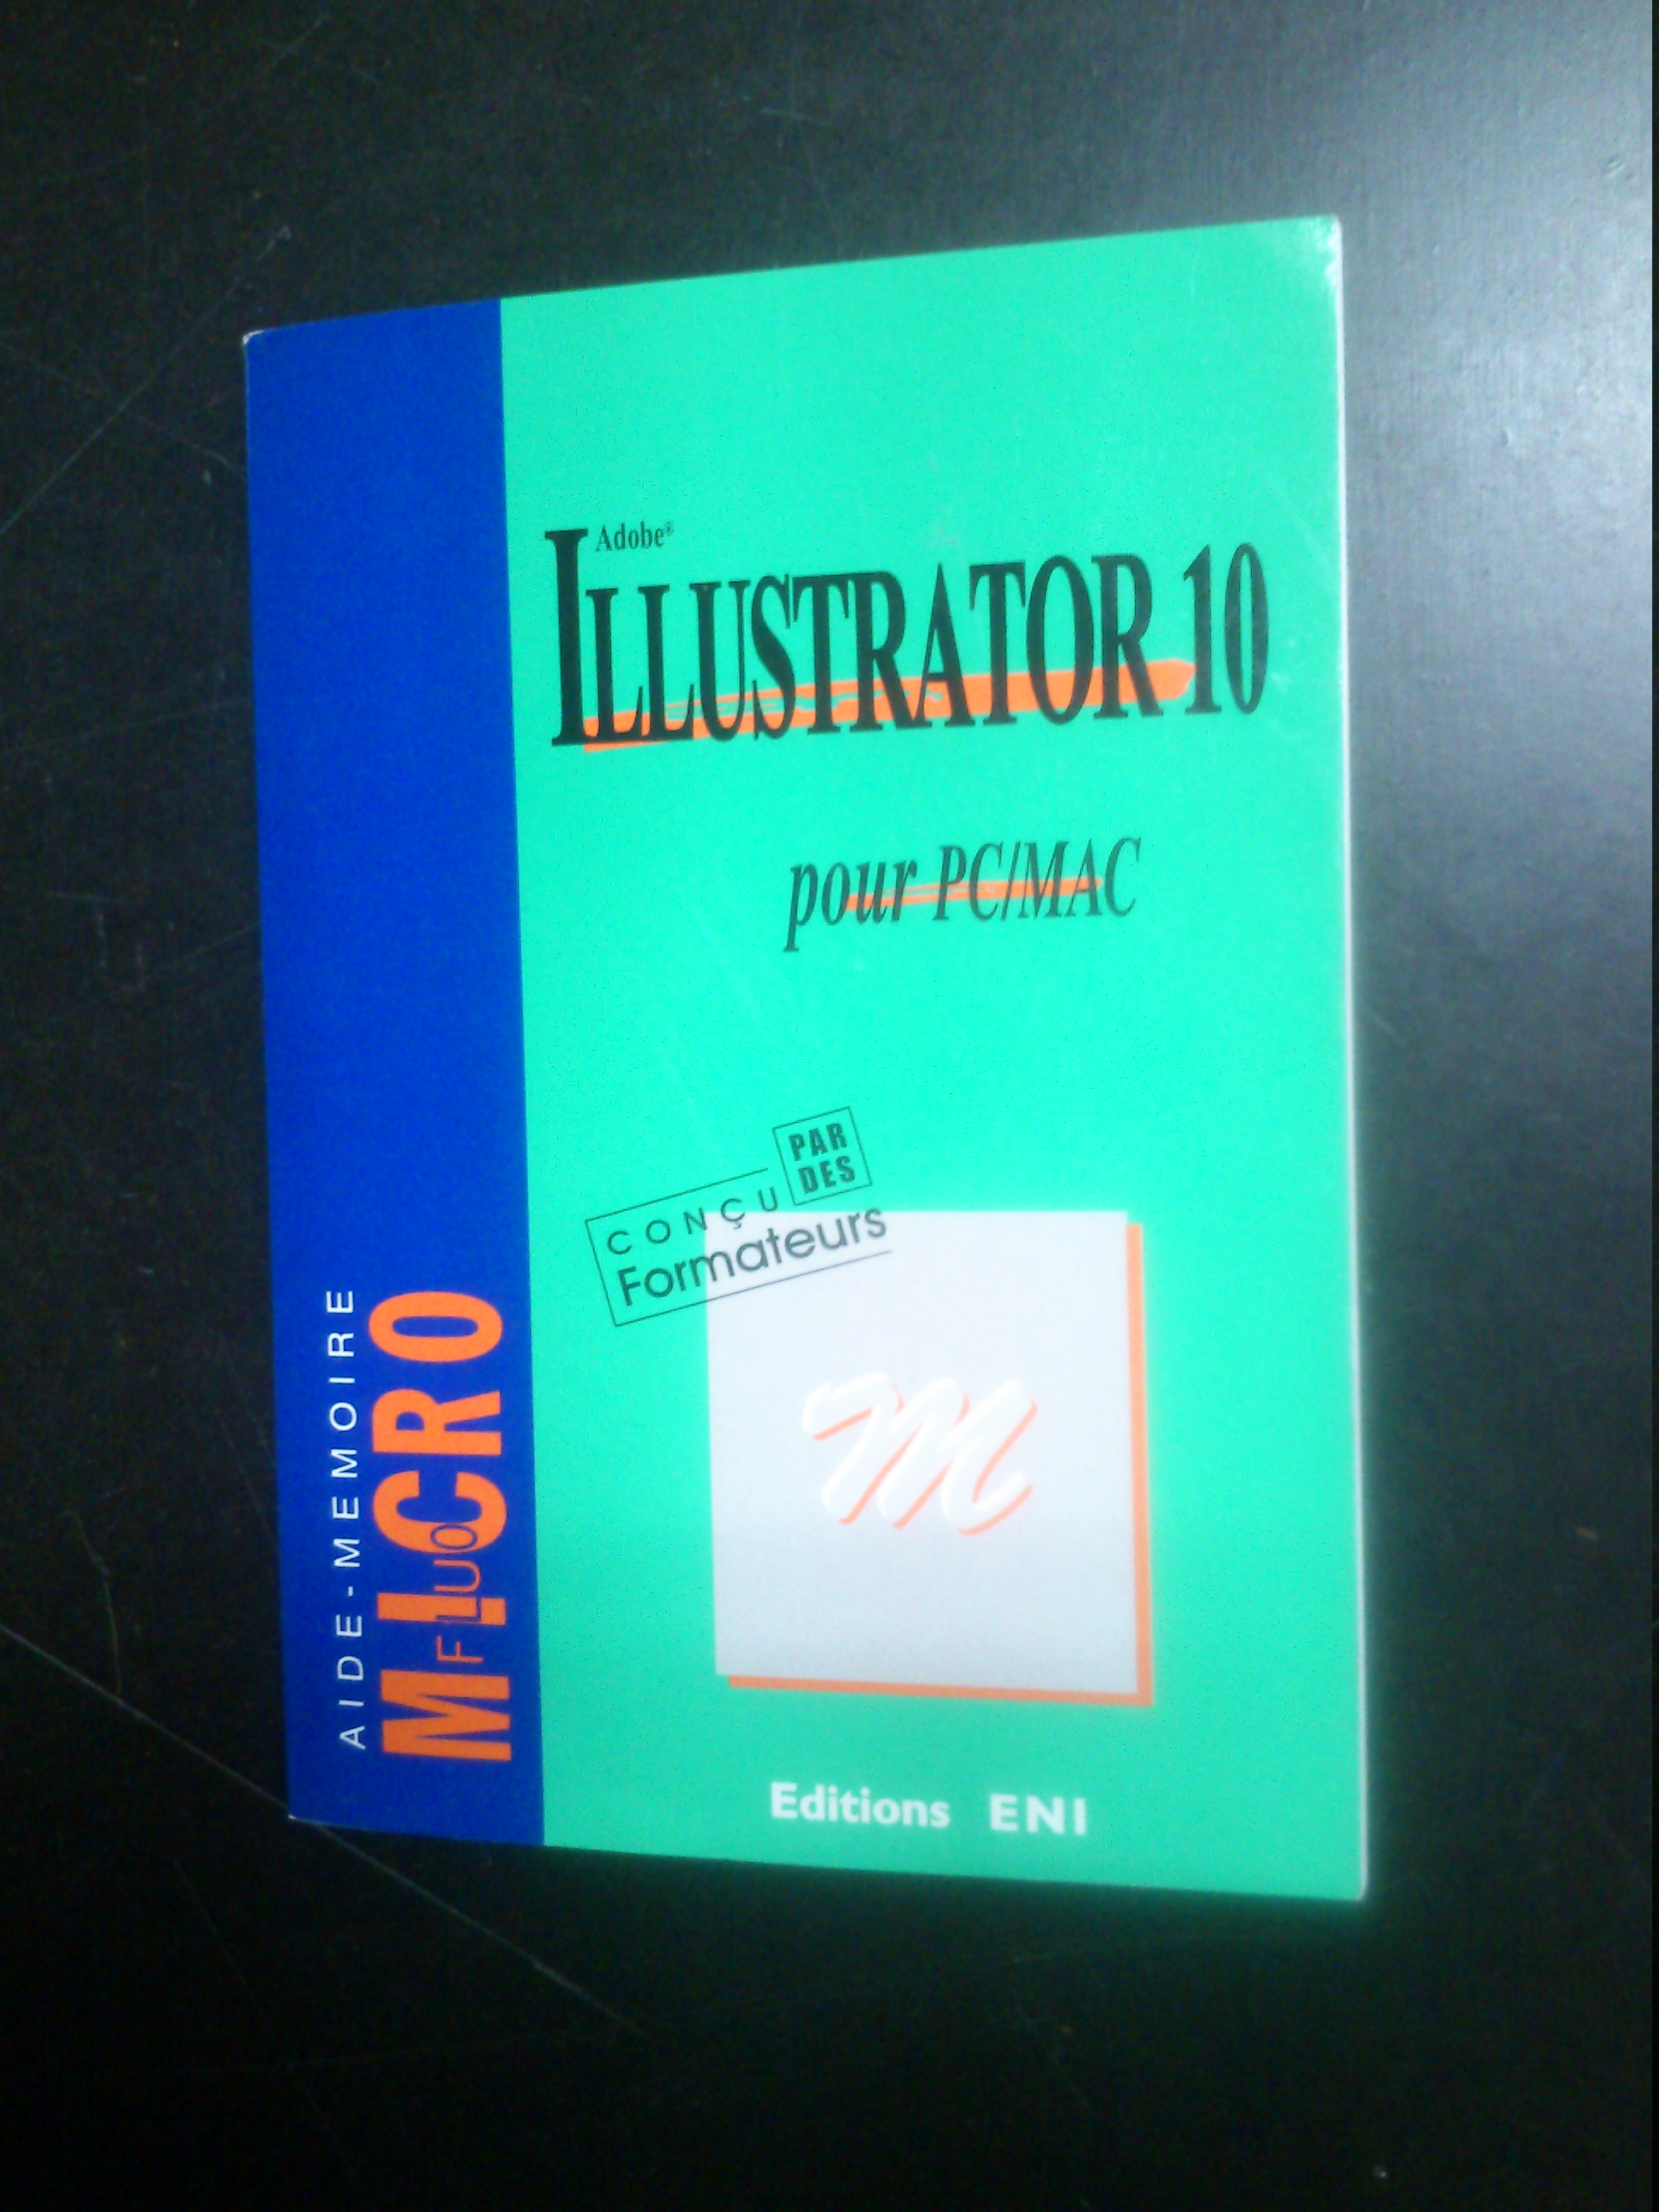 other/photos bibliothèque cambre/covers/DSC_0425.jpg